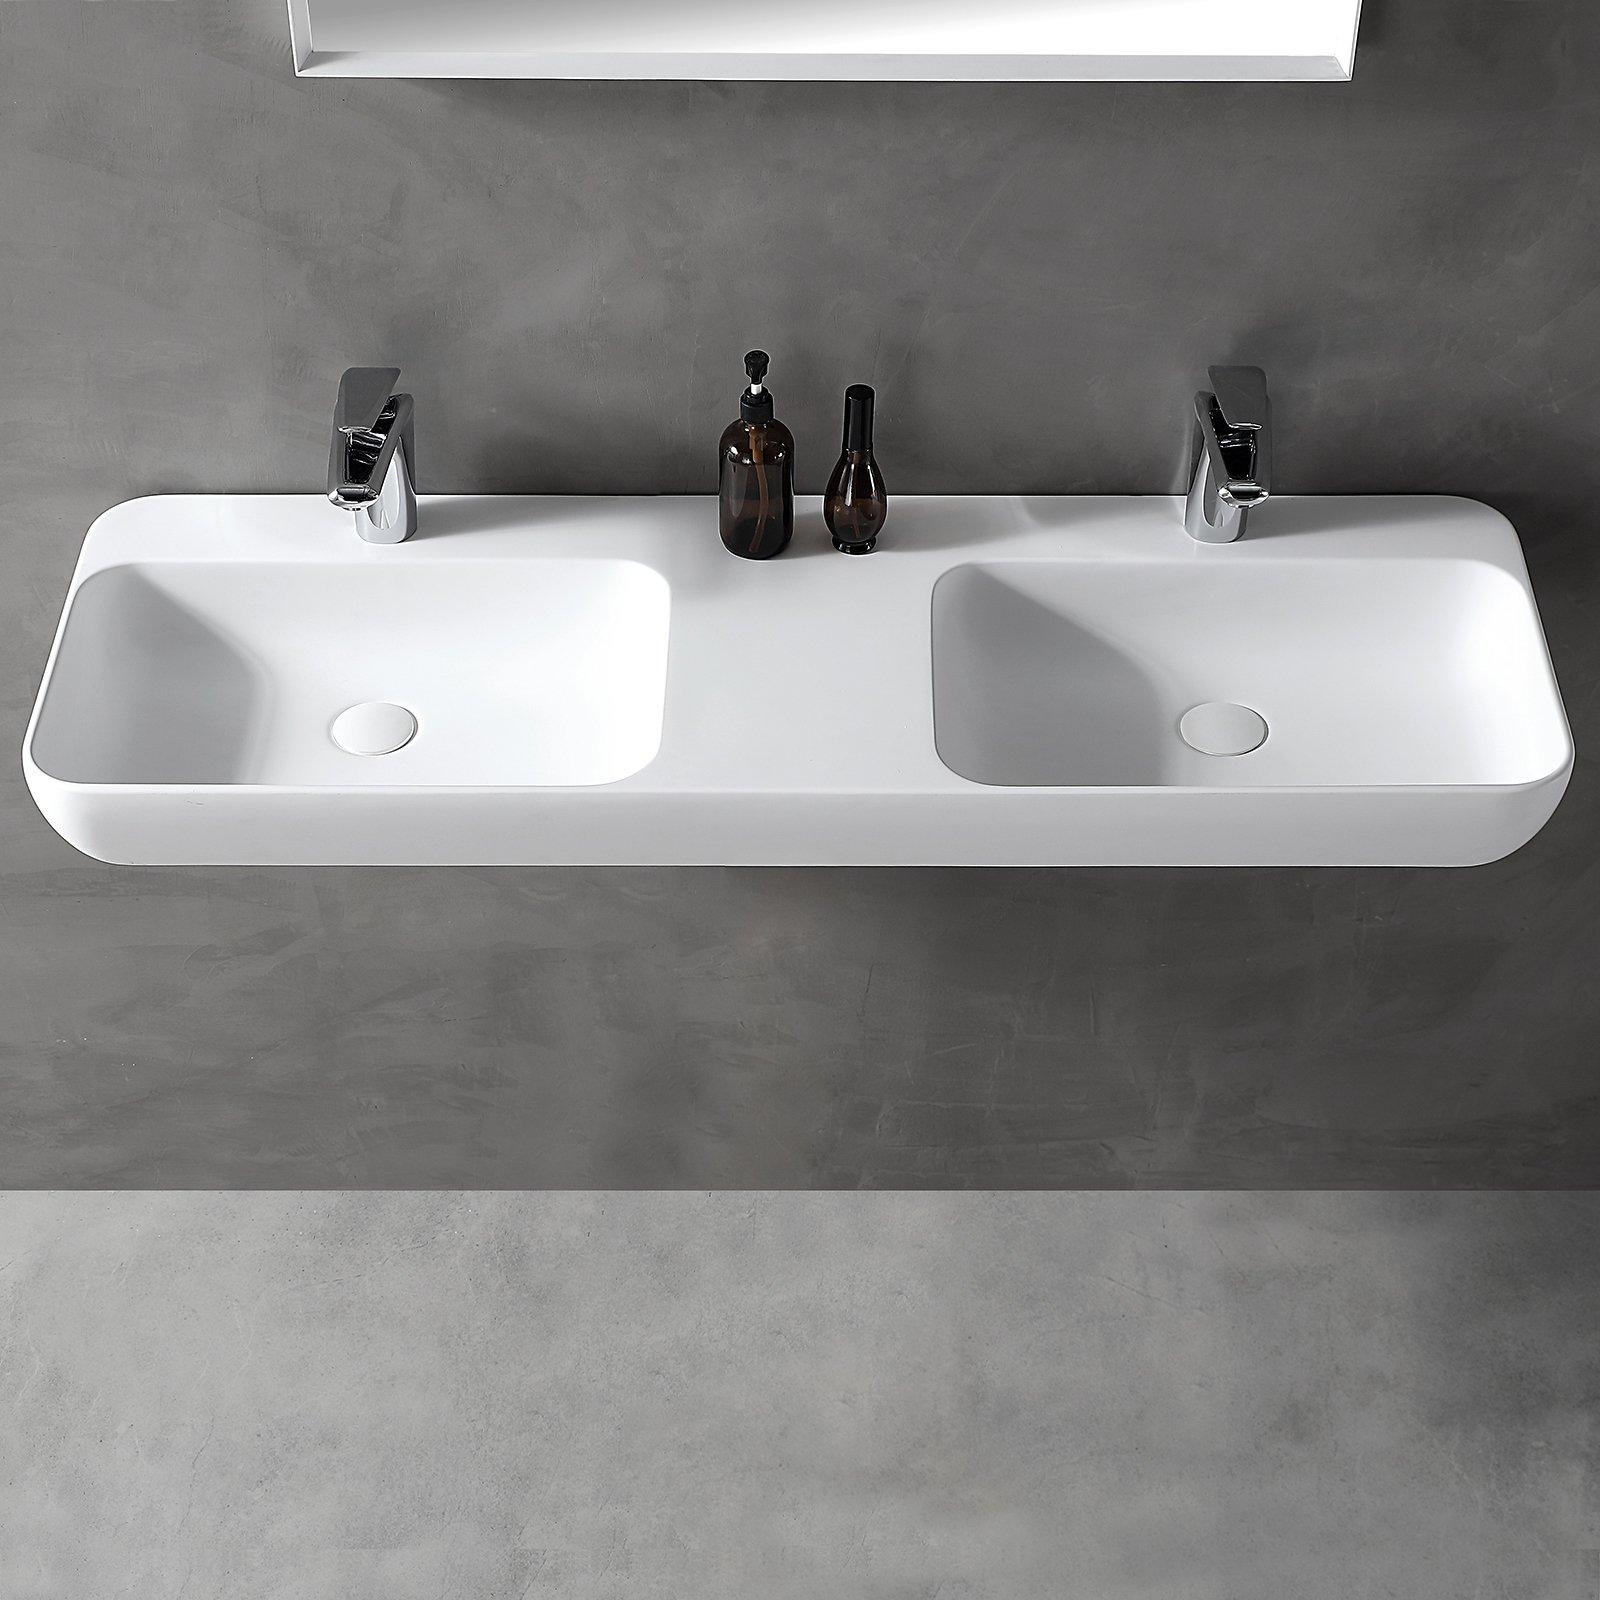 Wandwaschbecken Aufsatzwaschbecken TWG203 aus Mineralguss Solid Stone - Weiß matt - 120x40x12cm zoom thumbnail 3